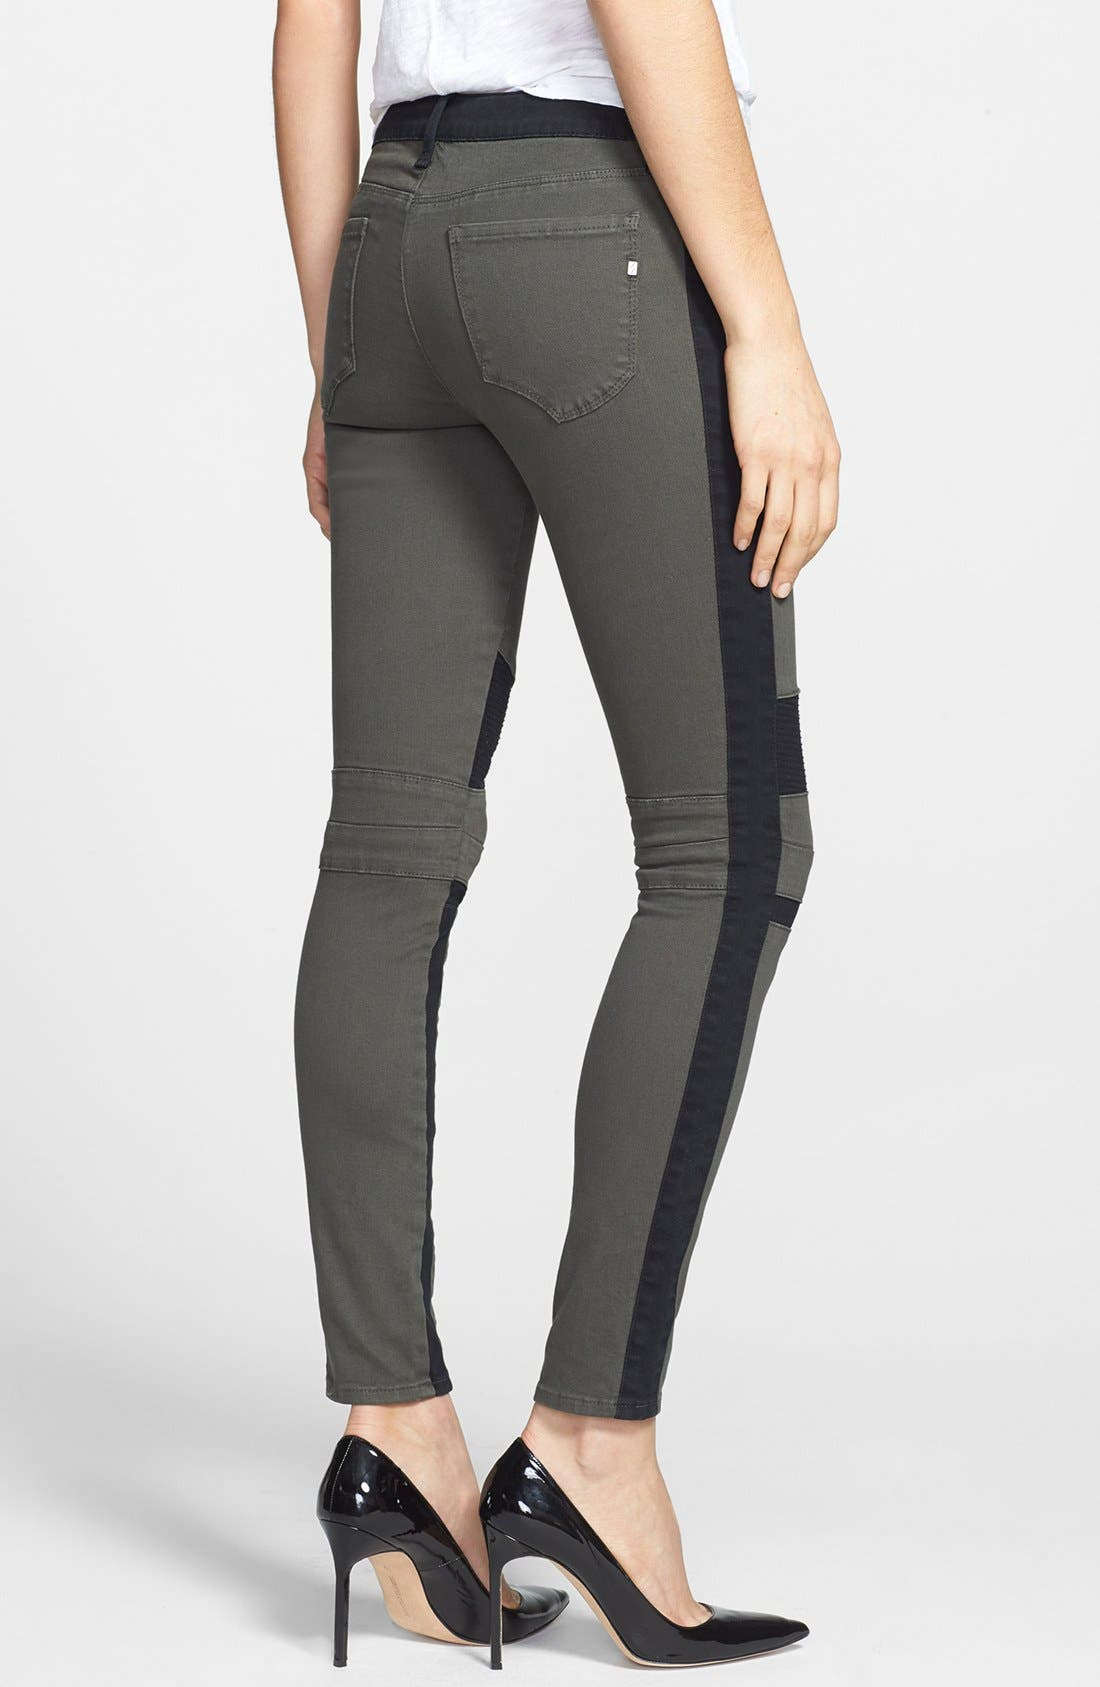 Alternate Image 2  - Genetic 'Sadie' Two-Tone Moto Skinny Jeans (Chrome)